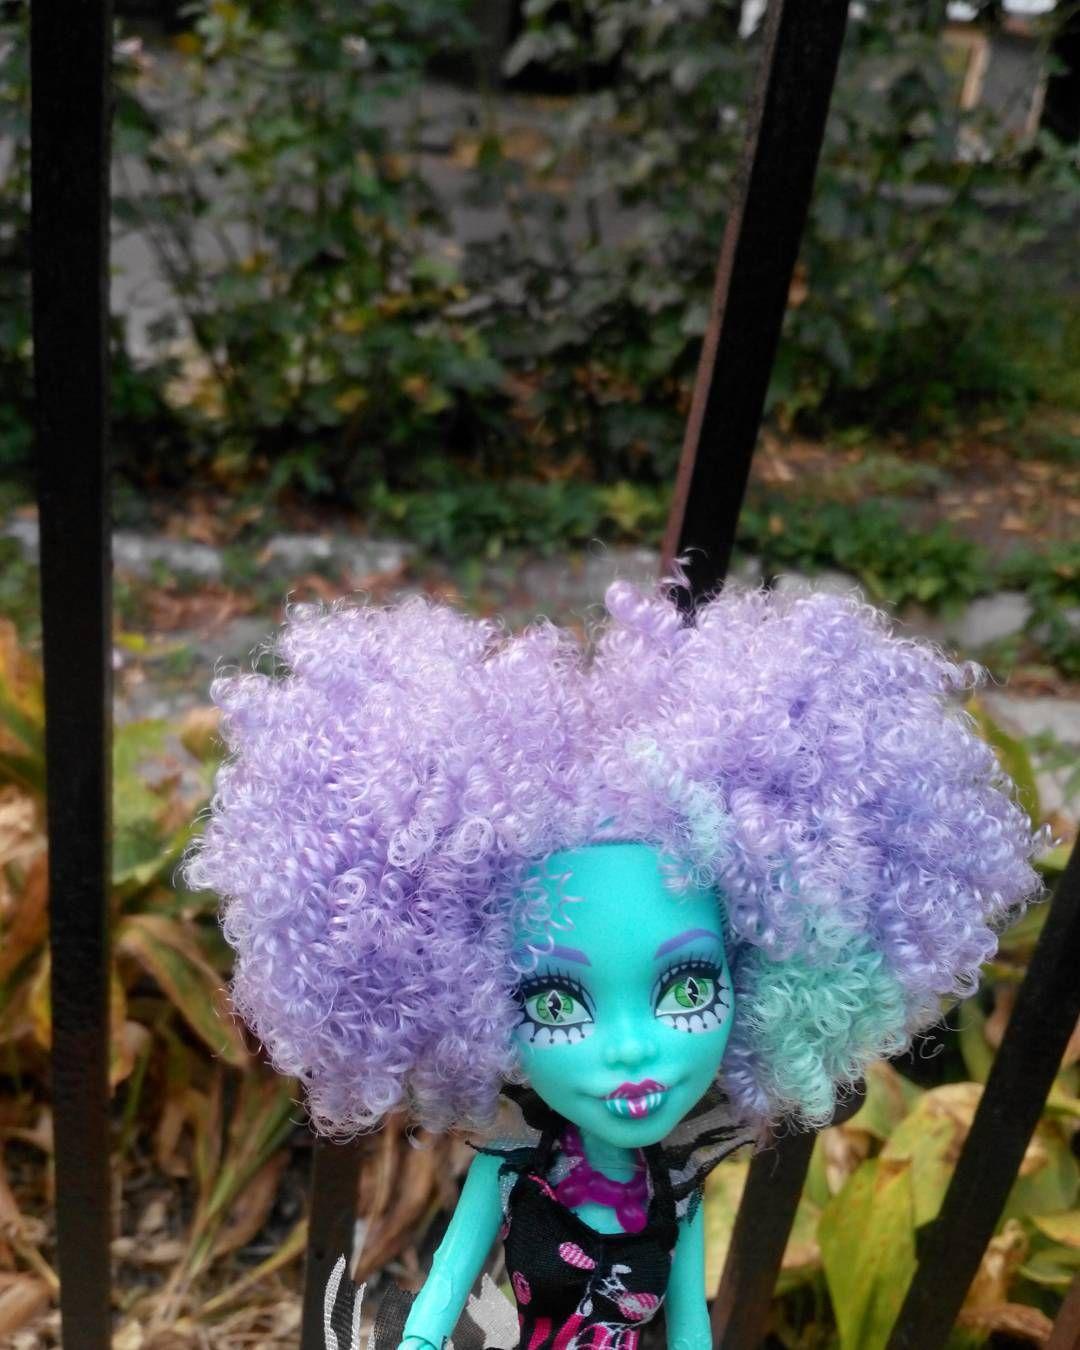 """#monsterhigh #mh #honeyswamp #freakduchic #doll #монстерхай #мх #ханисвомп #фрикдушик #кукла"""